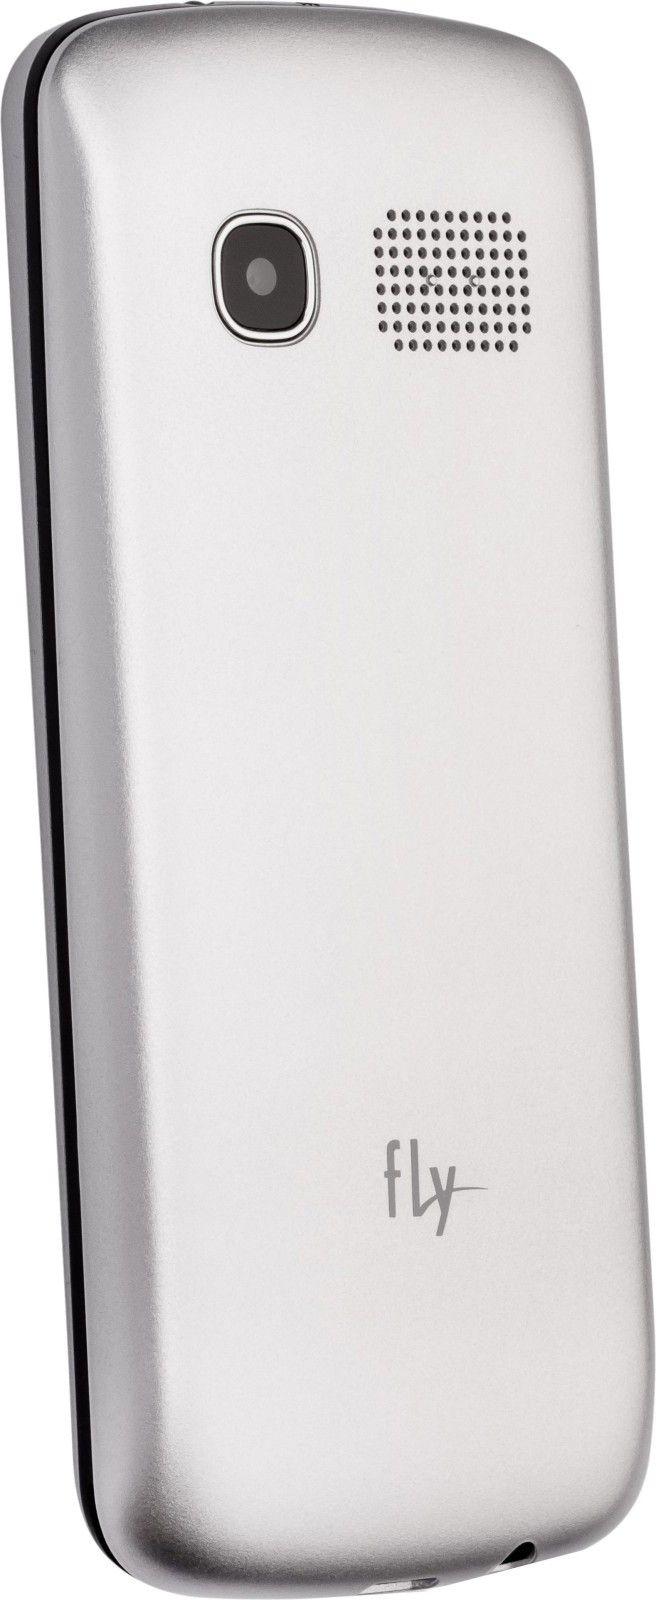 Мобильный телефон Fly TS111 White - 1